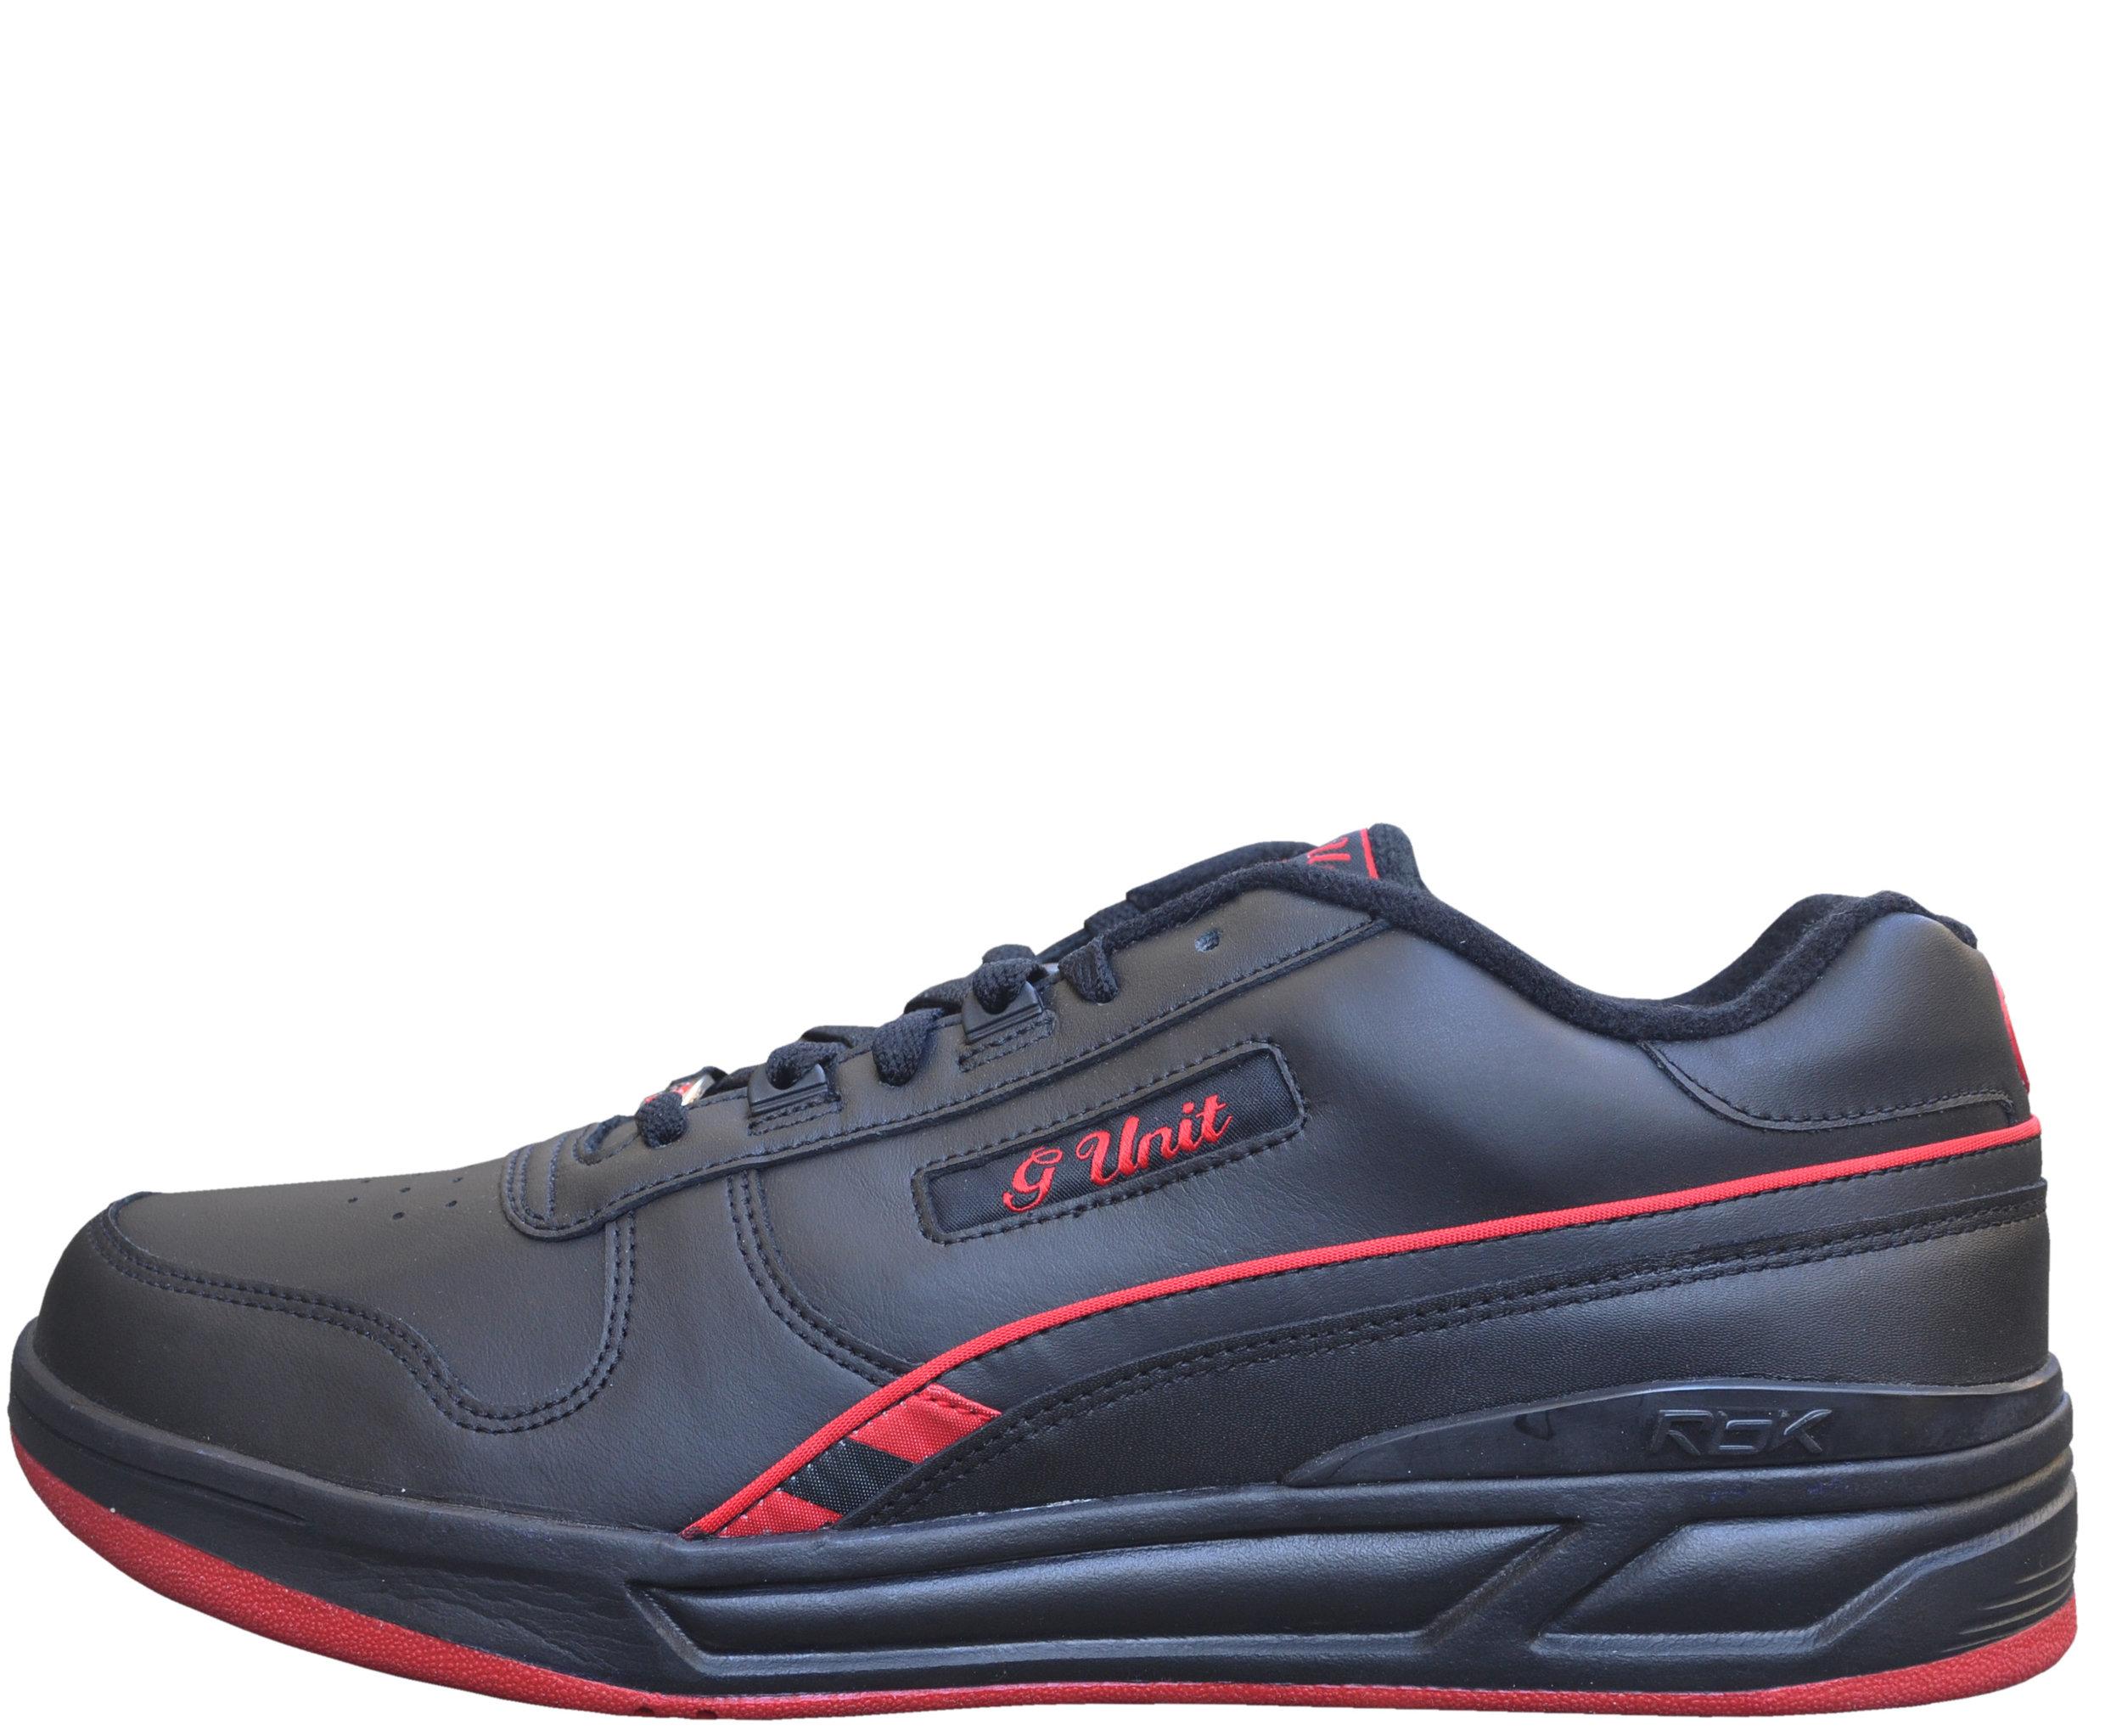 Reebok G Unit G6II Black / Red (Size 12